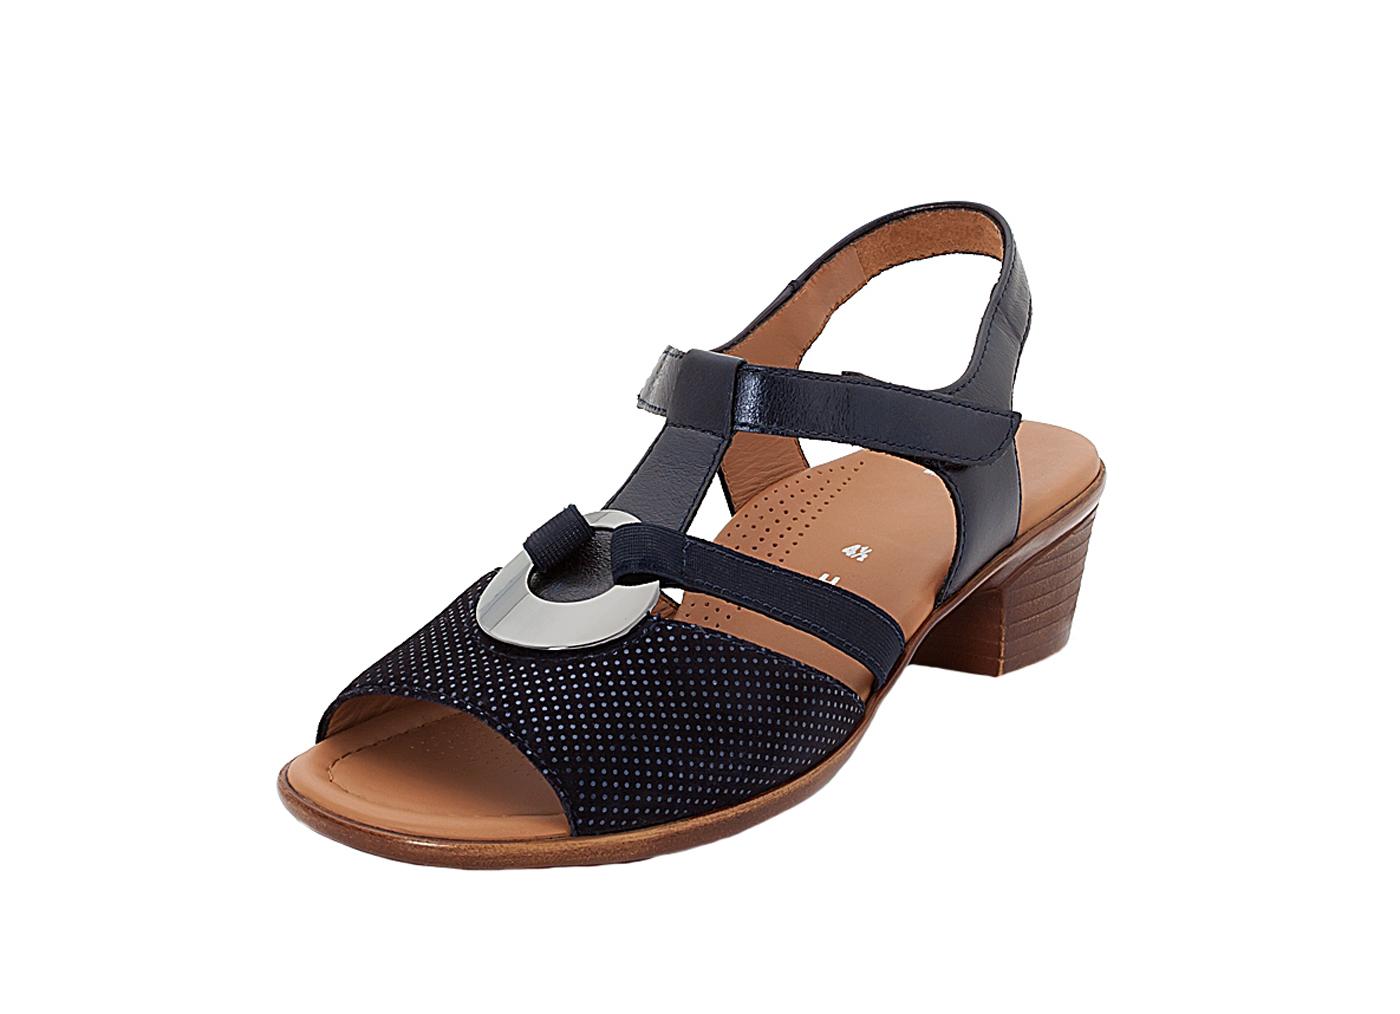 ara Damen Sandalette 12-35715-14 blau Damenschuhe Sandalen   Sandaletten c2a4bc17ce